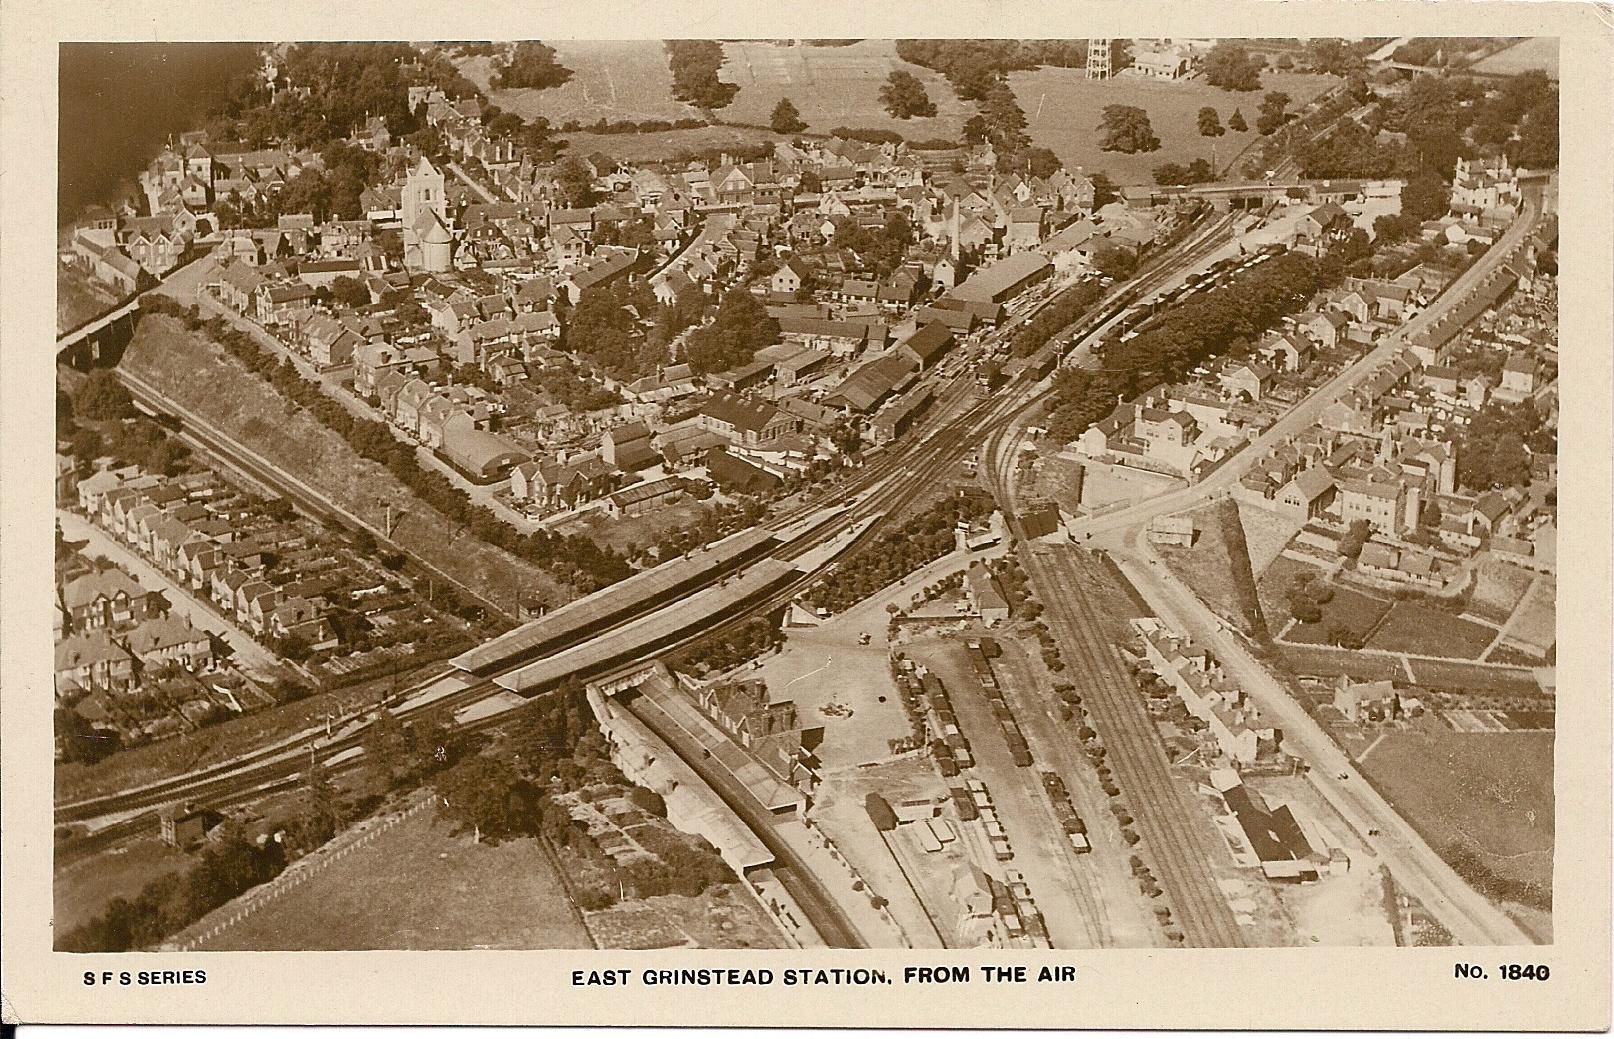 FileEast Grinstead station aerial viewjpg FileEast Grinstead